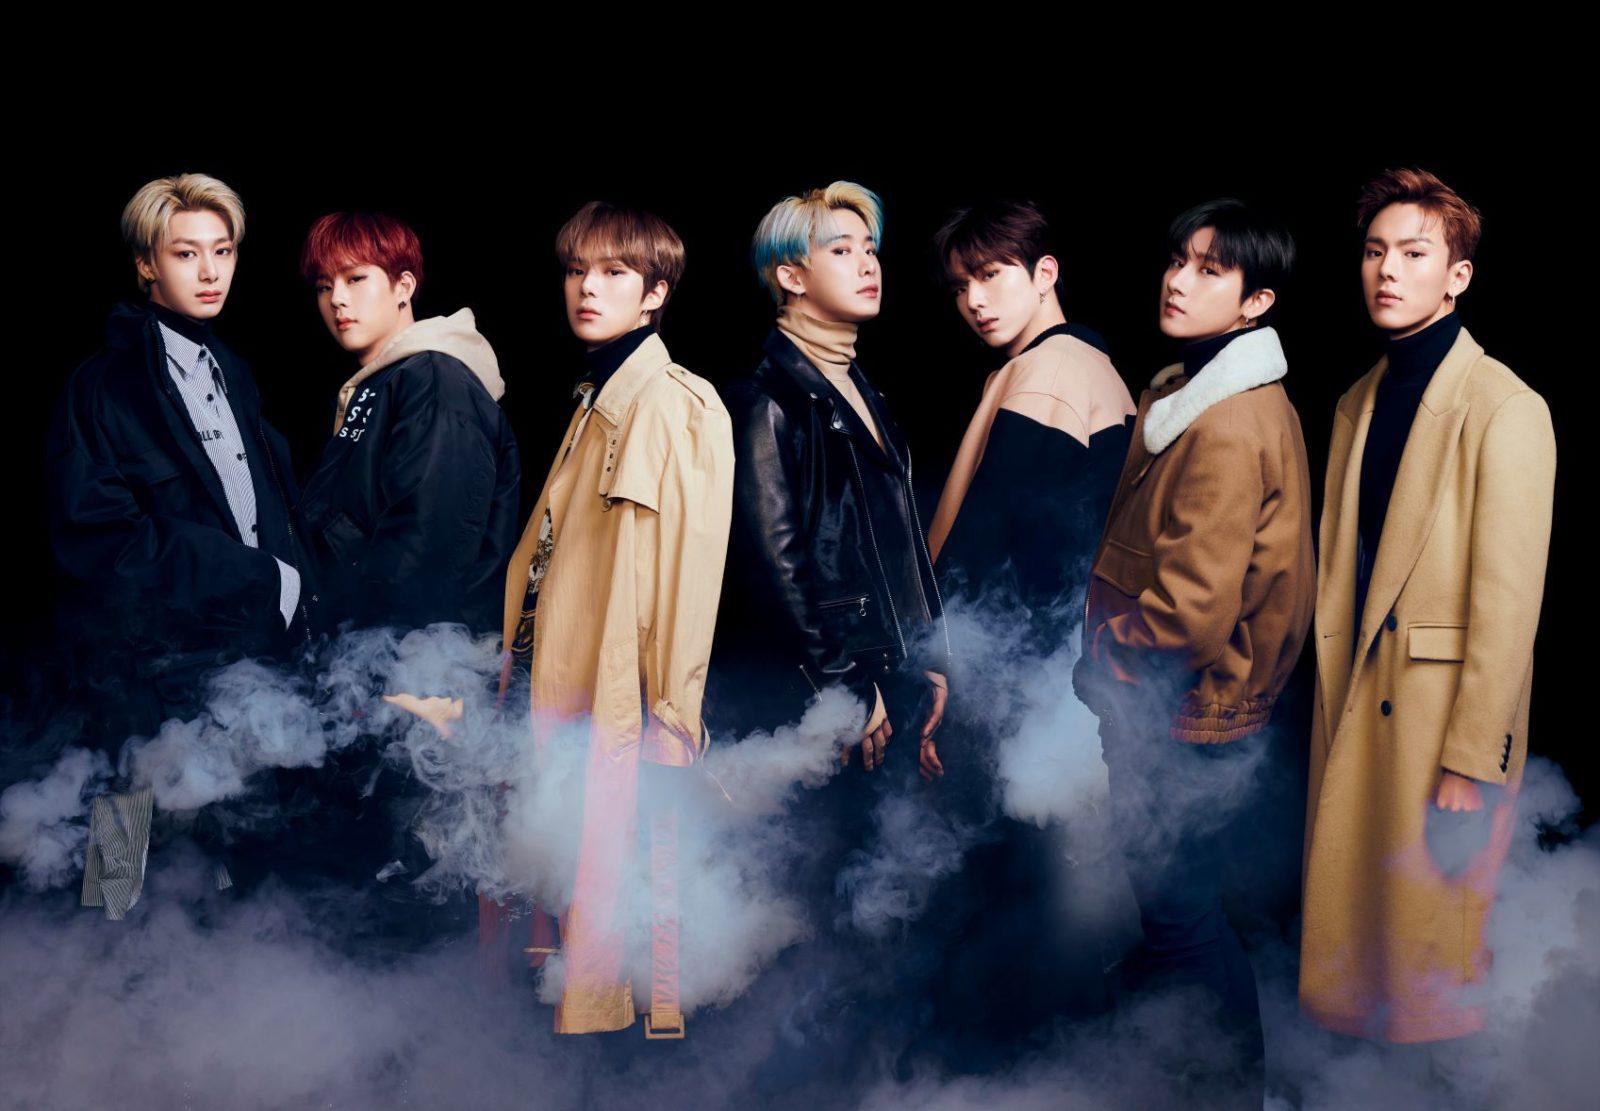 MONSTA X、韓国で4冠を達成した日本語ver. 5thシングル「Shoot Out」発売決定&新ビジュアル解禁サムネイル画像